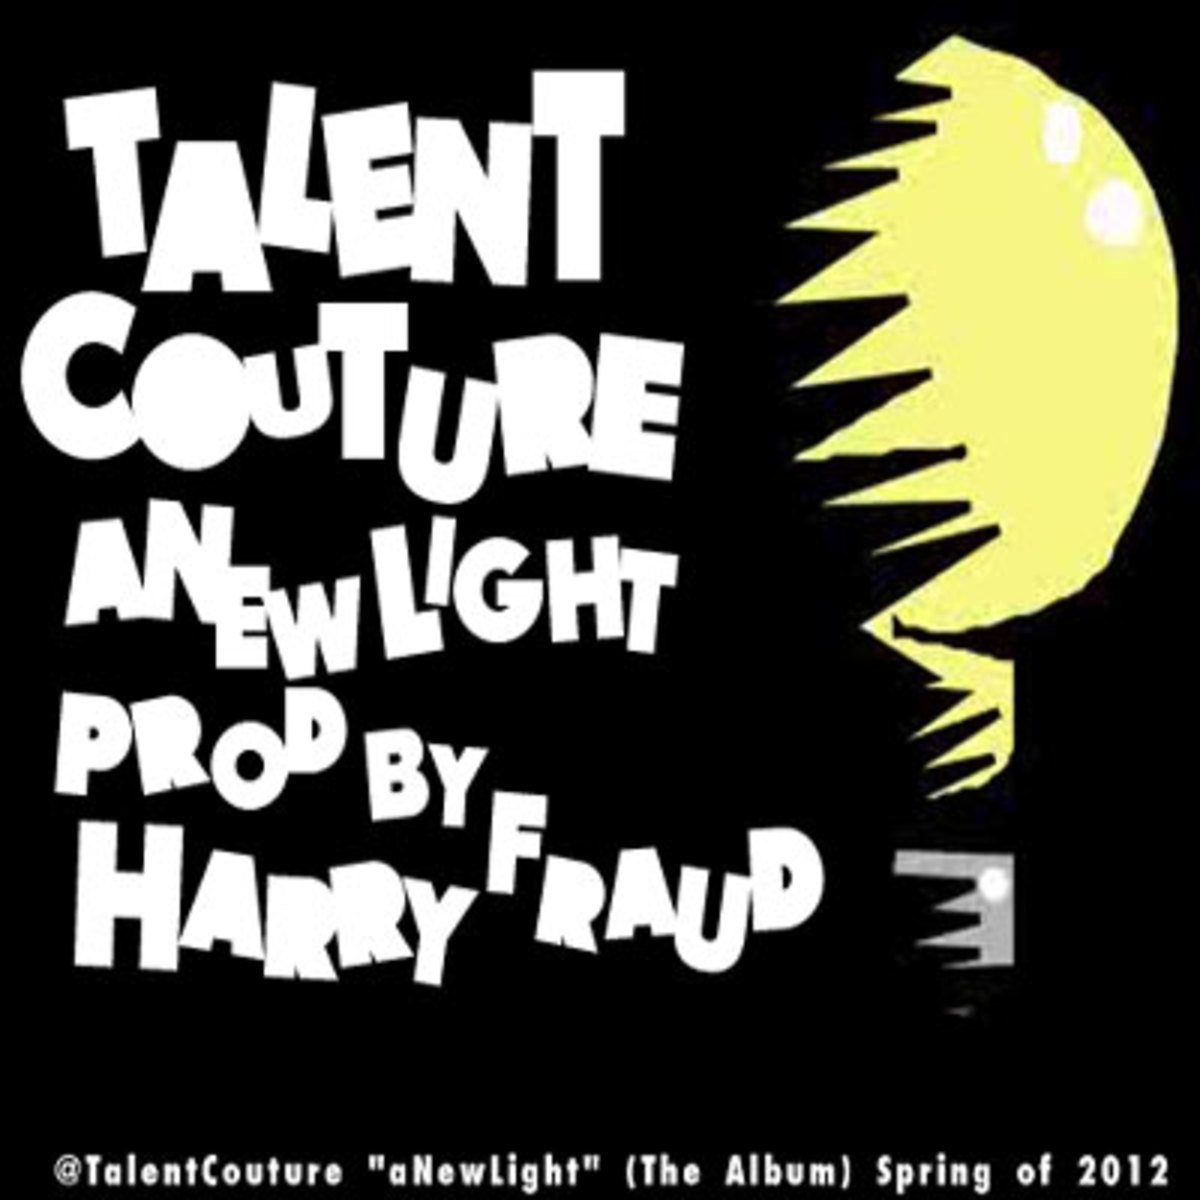 talentcouture-anewlight.jpg